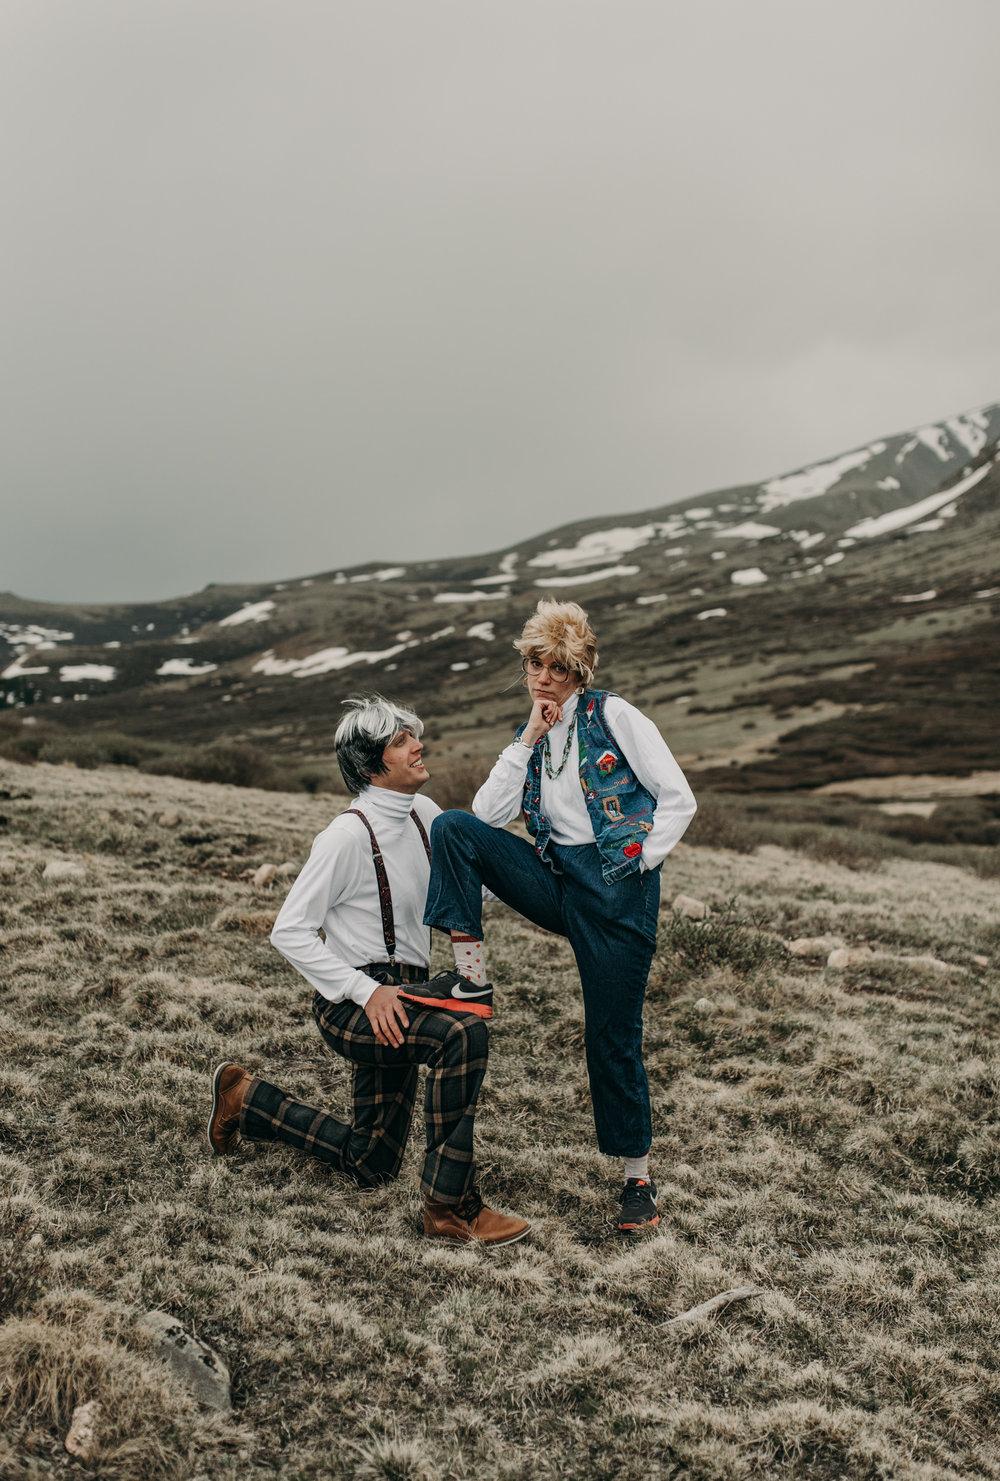 Wedding photographer in Georgetown, Colorado